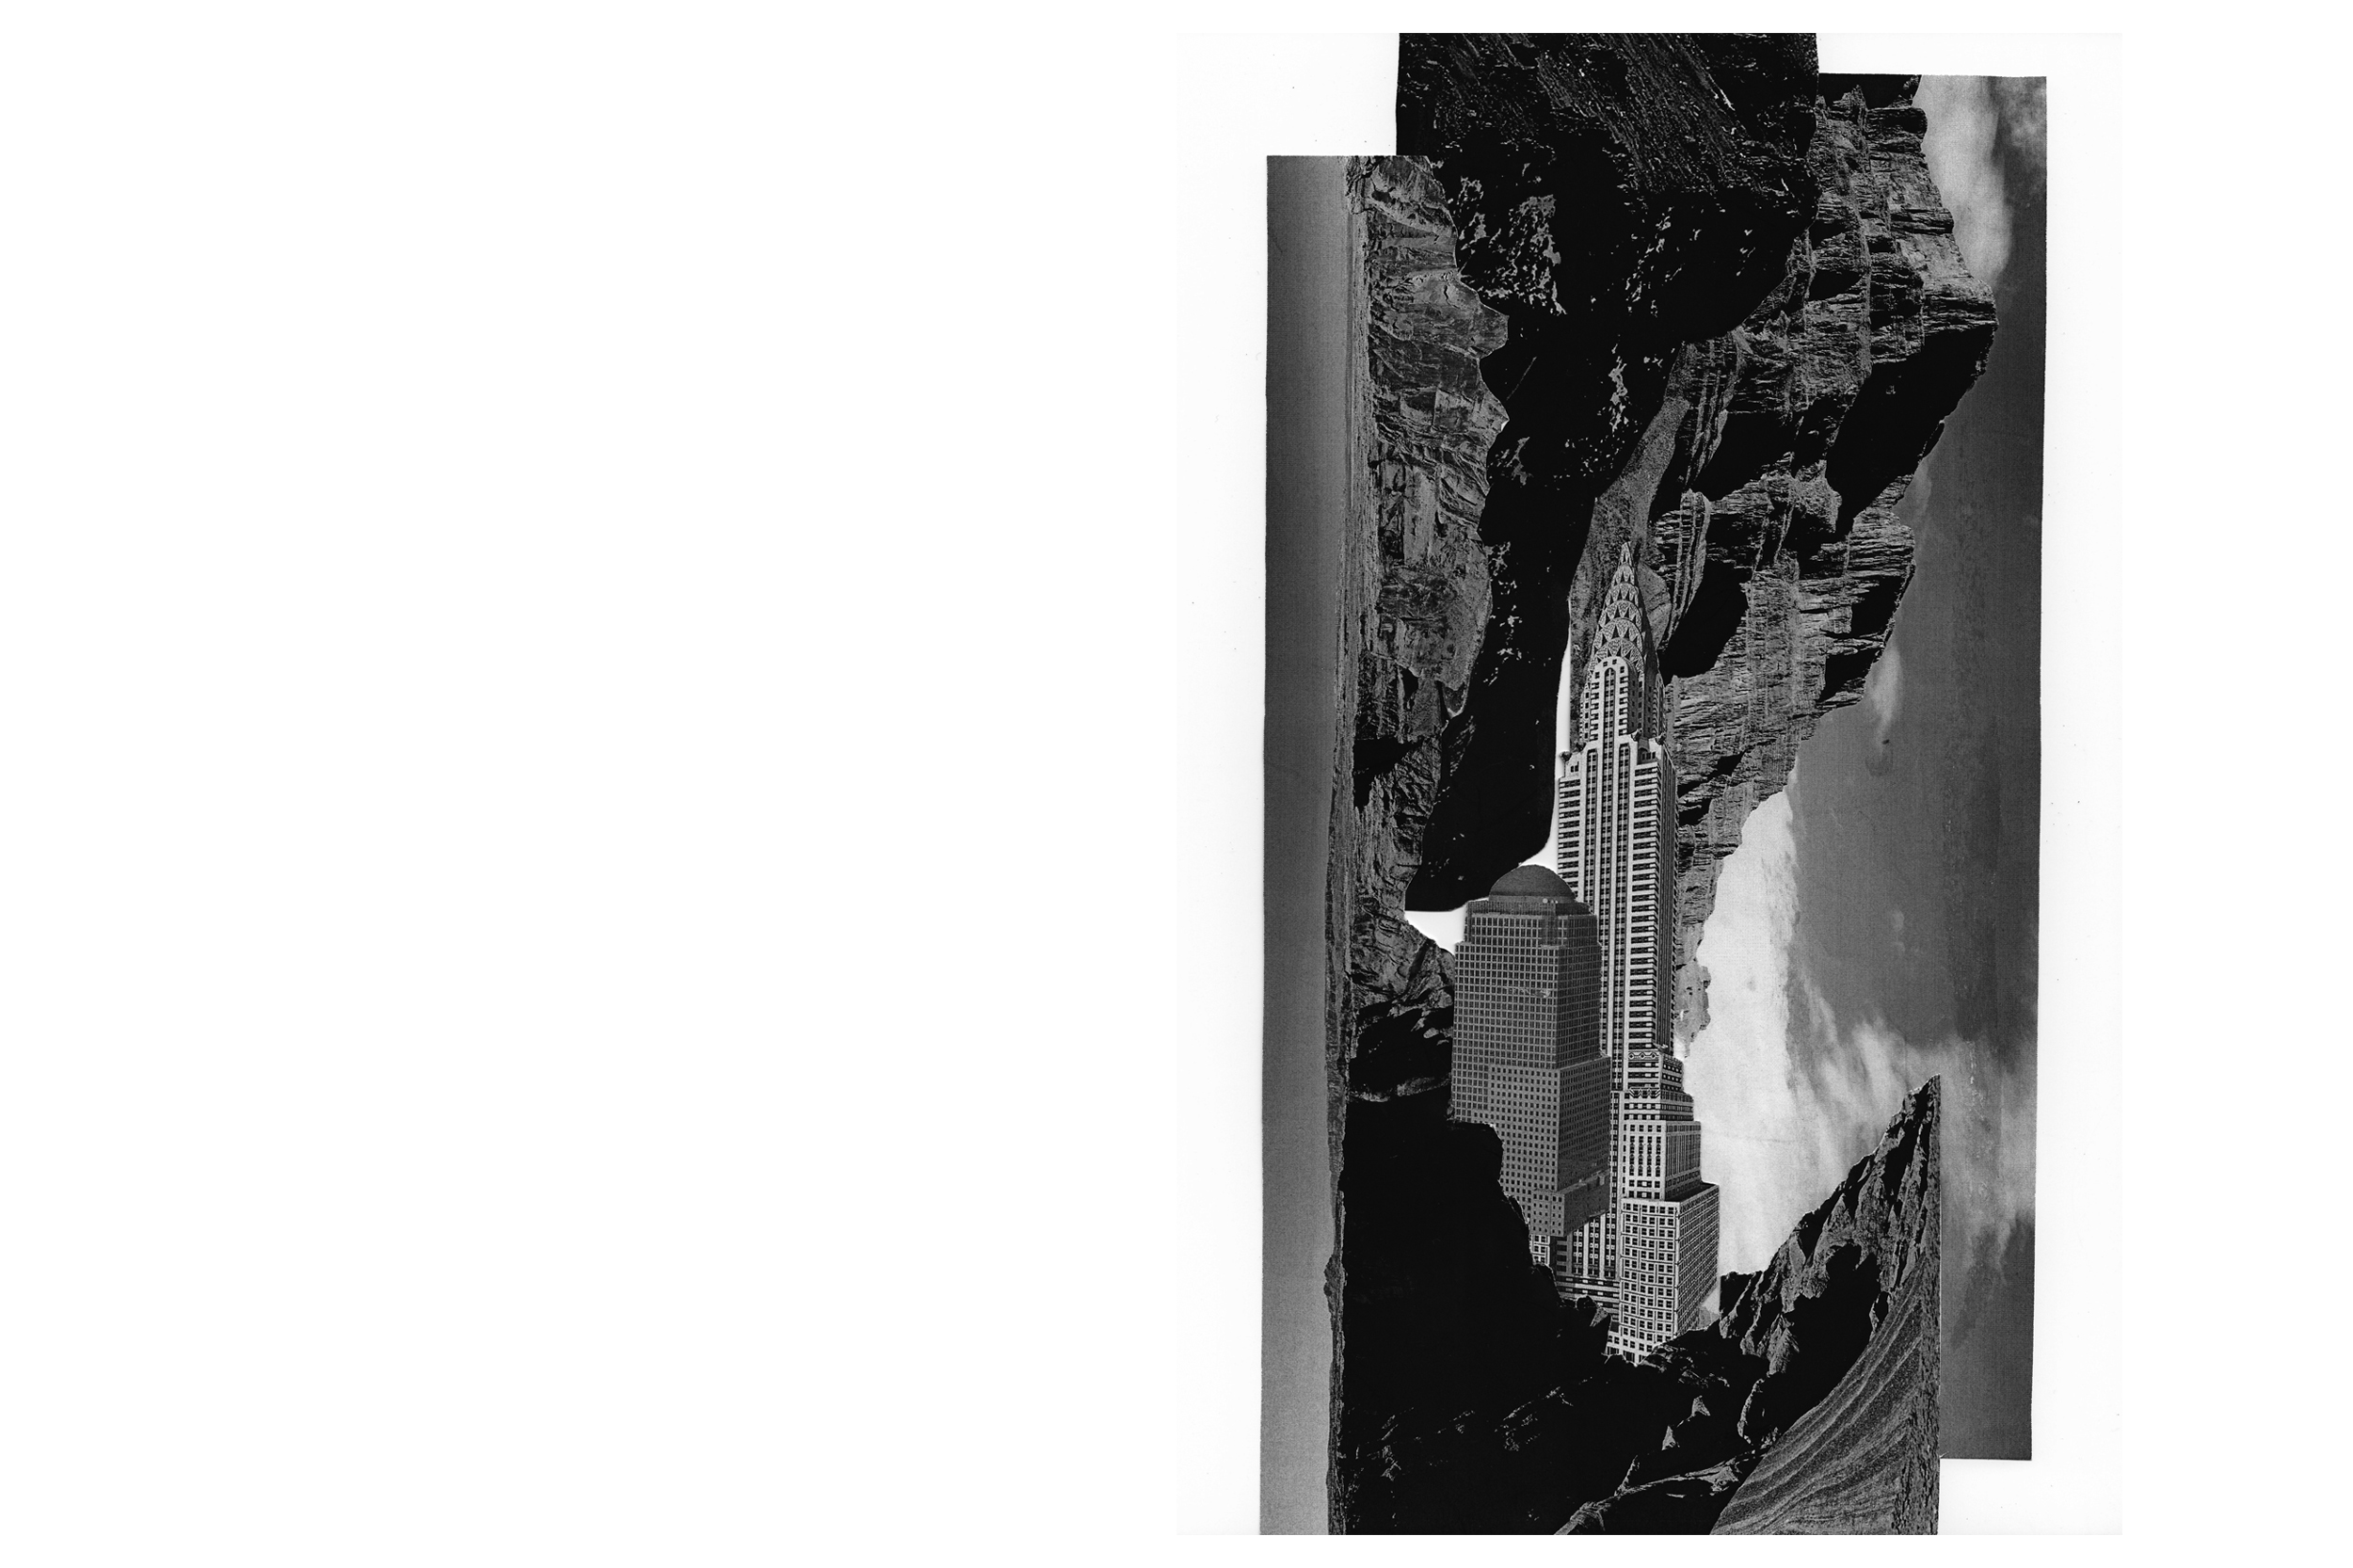 FARADAY_collage_landscraper.jpg